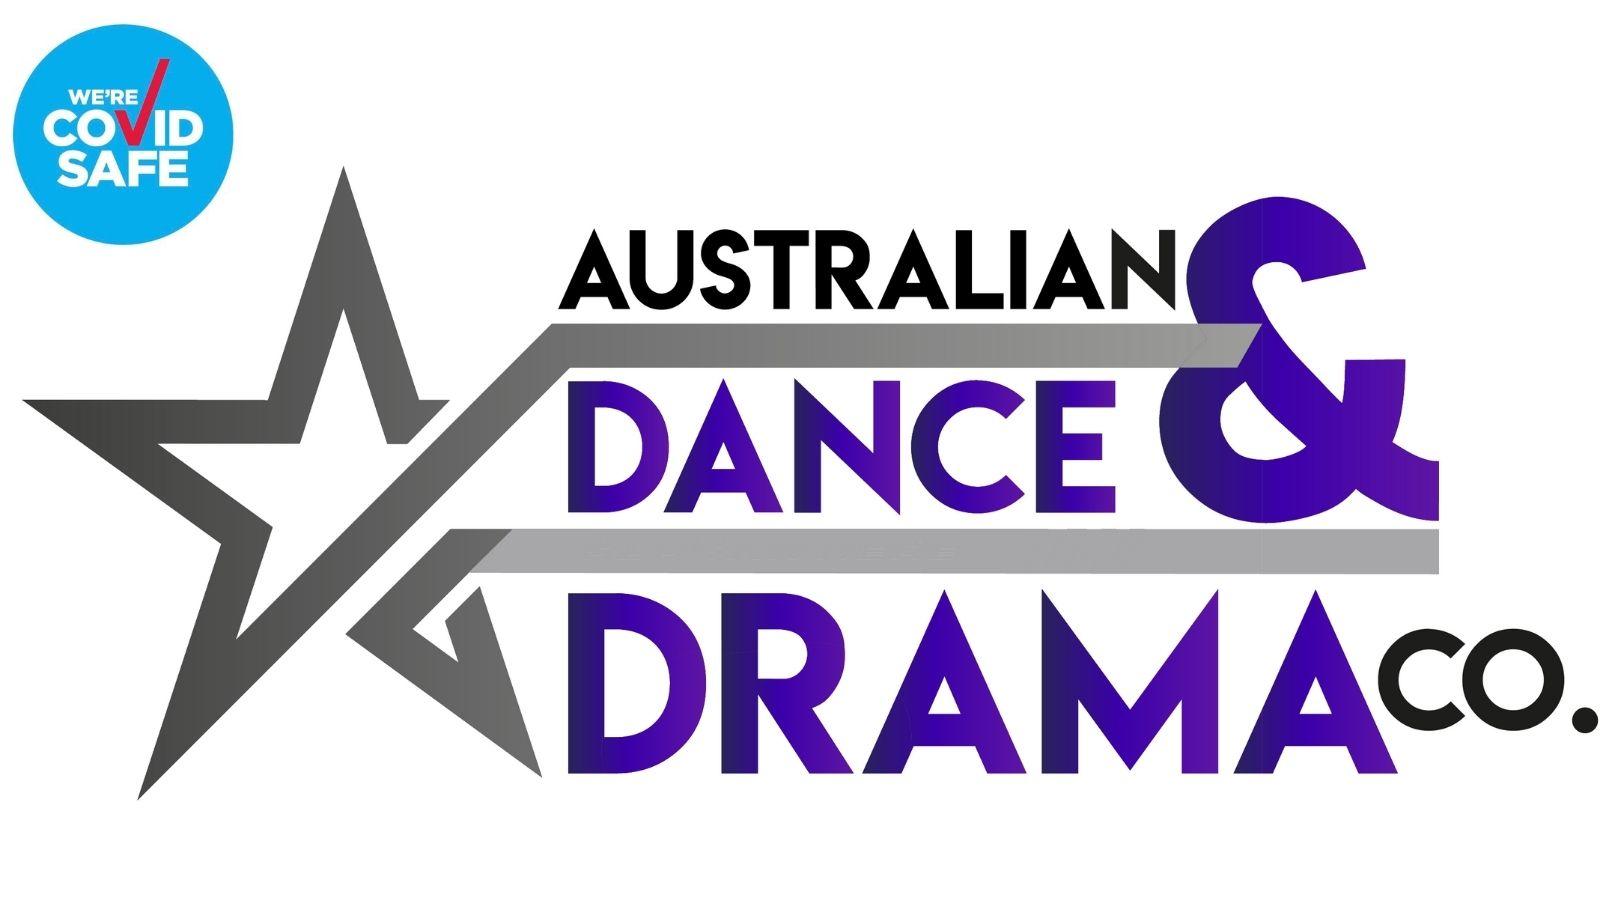 Australian Dance and Drama Co.